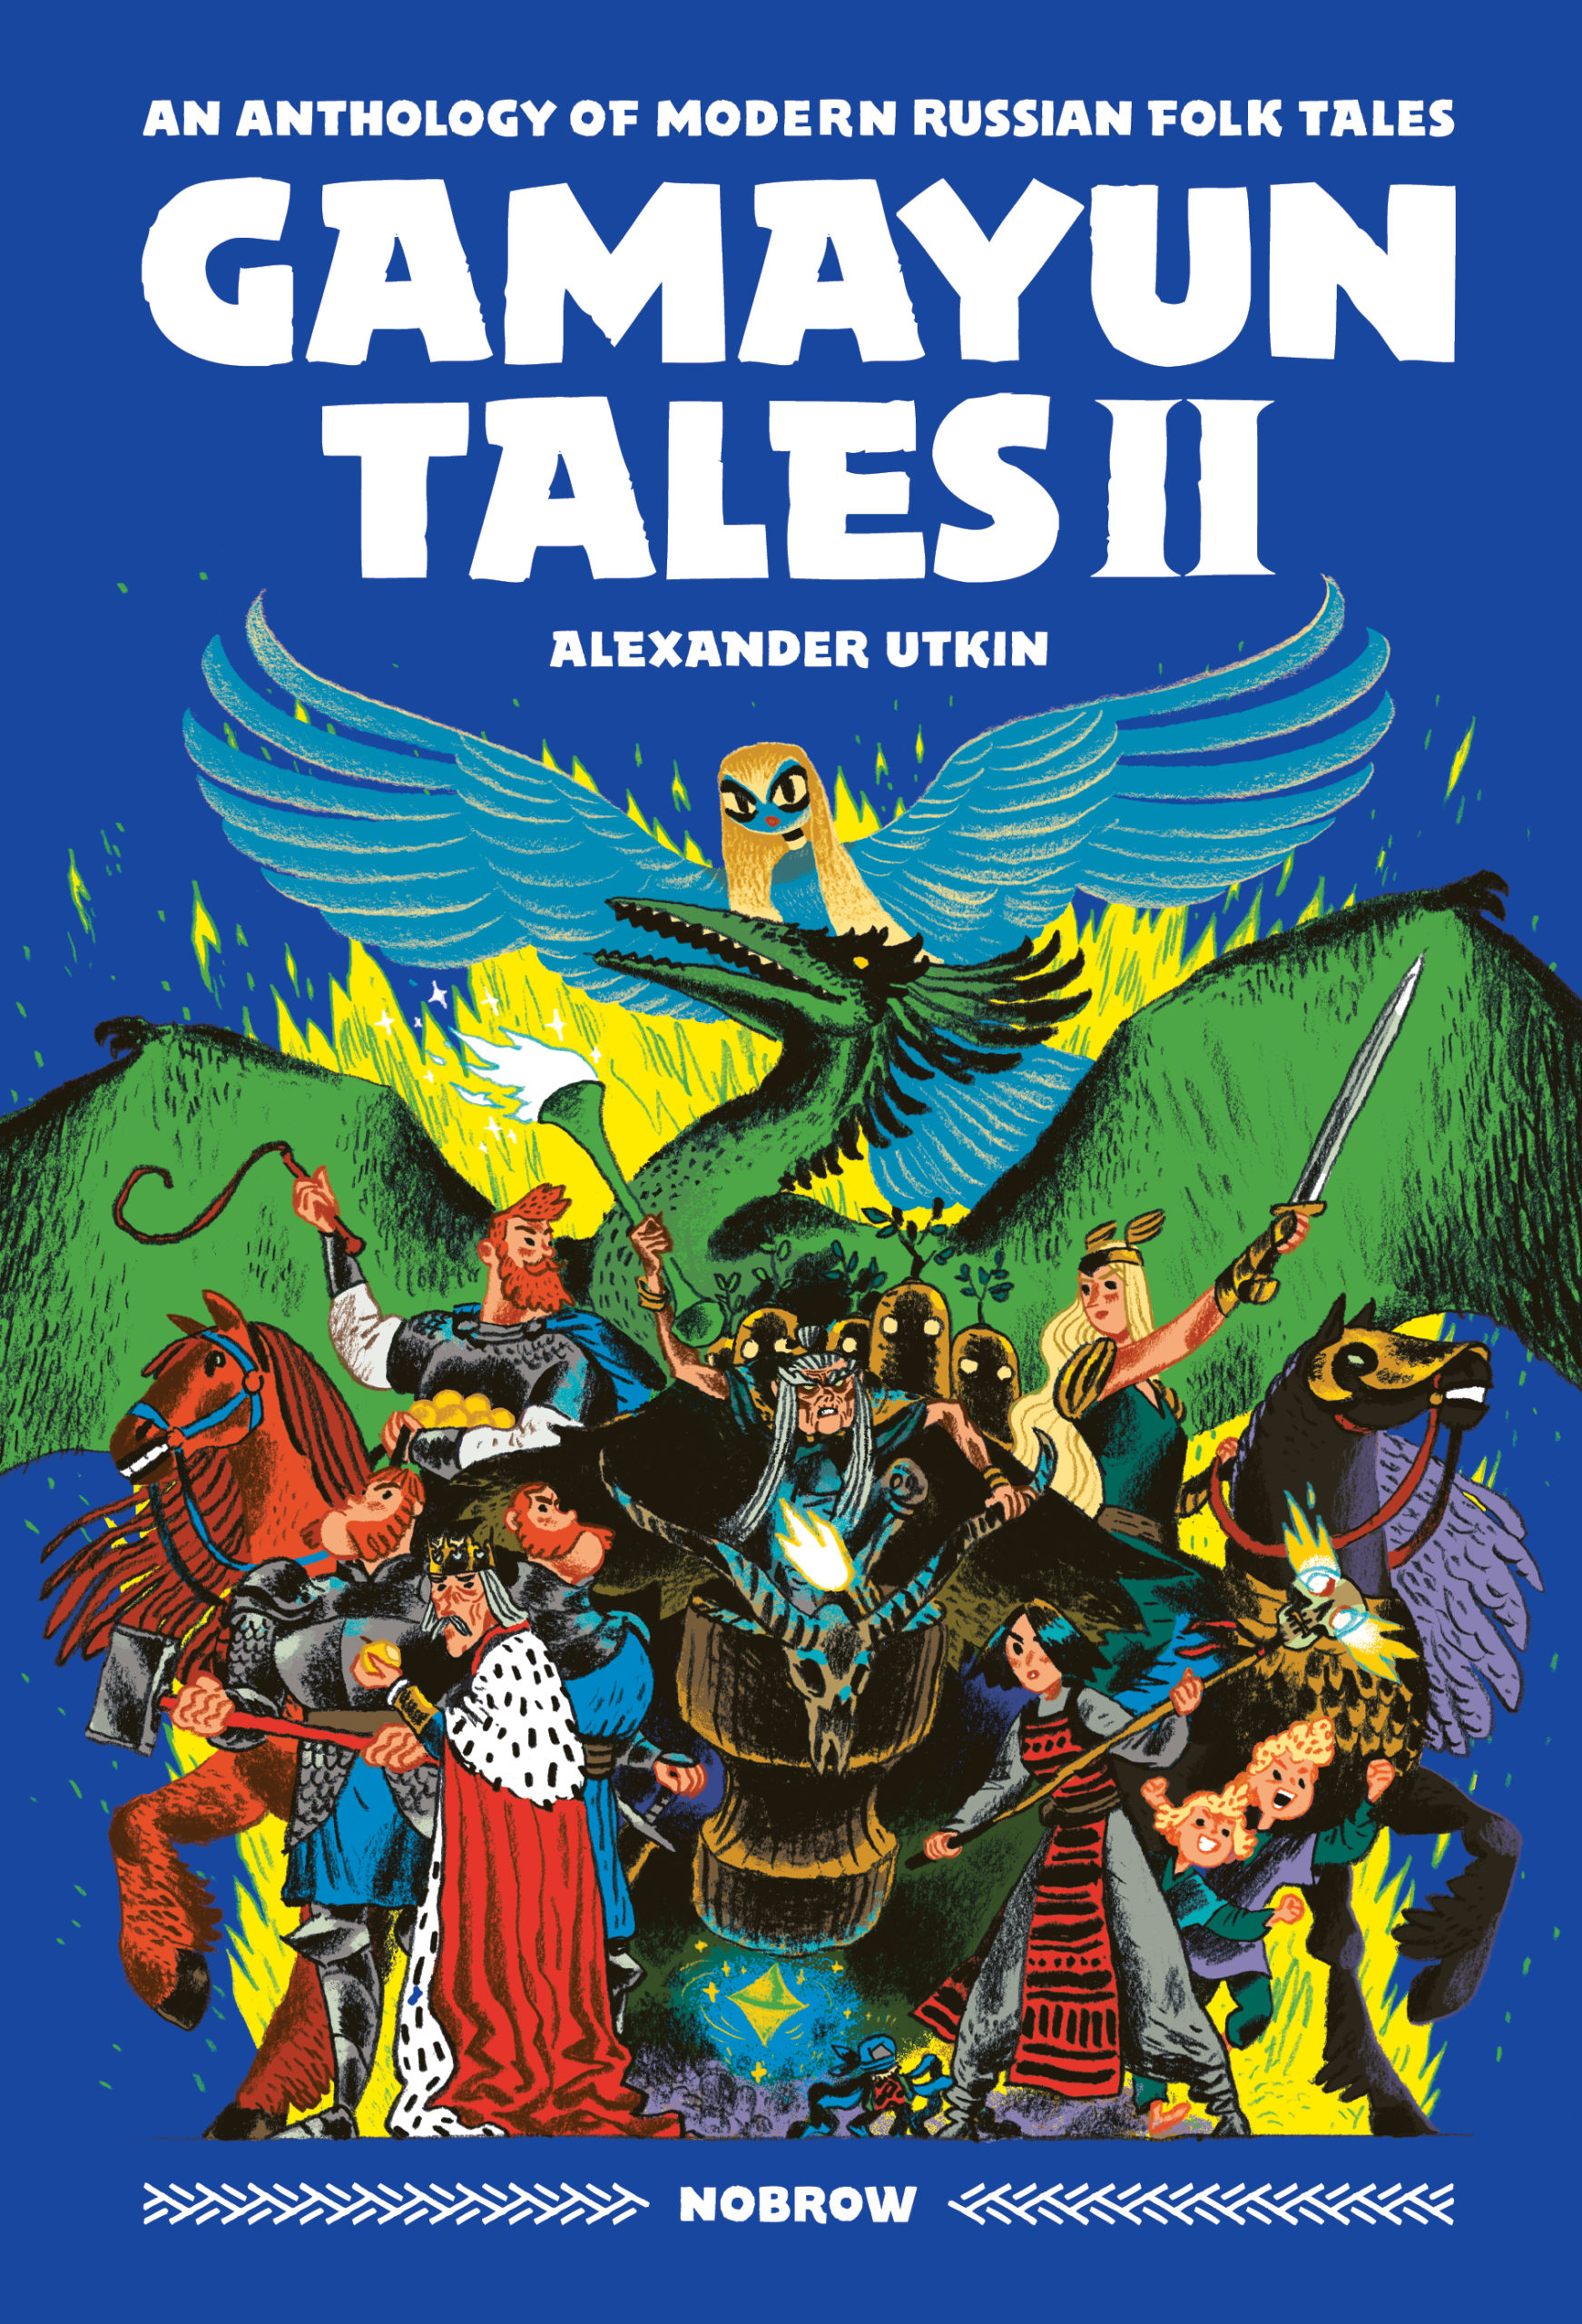 Gamayun Tales II: An Anthology of Modern Russian Folk Tales